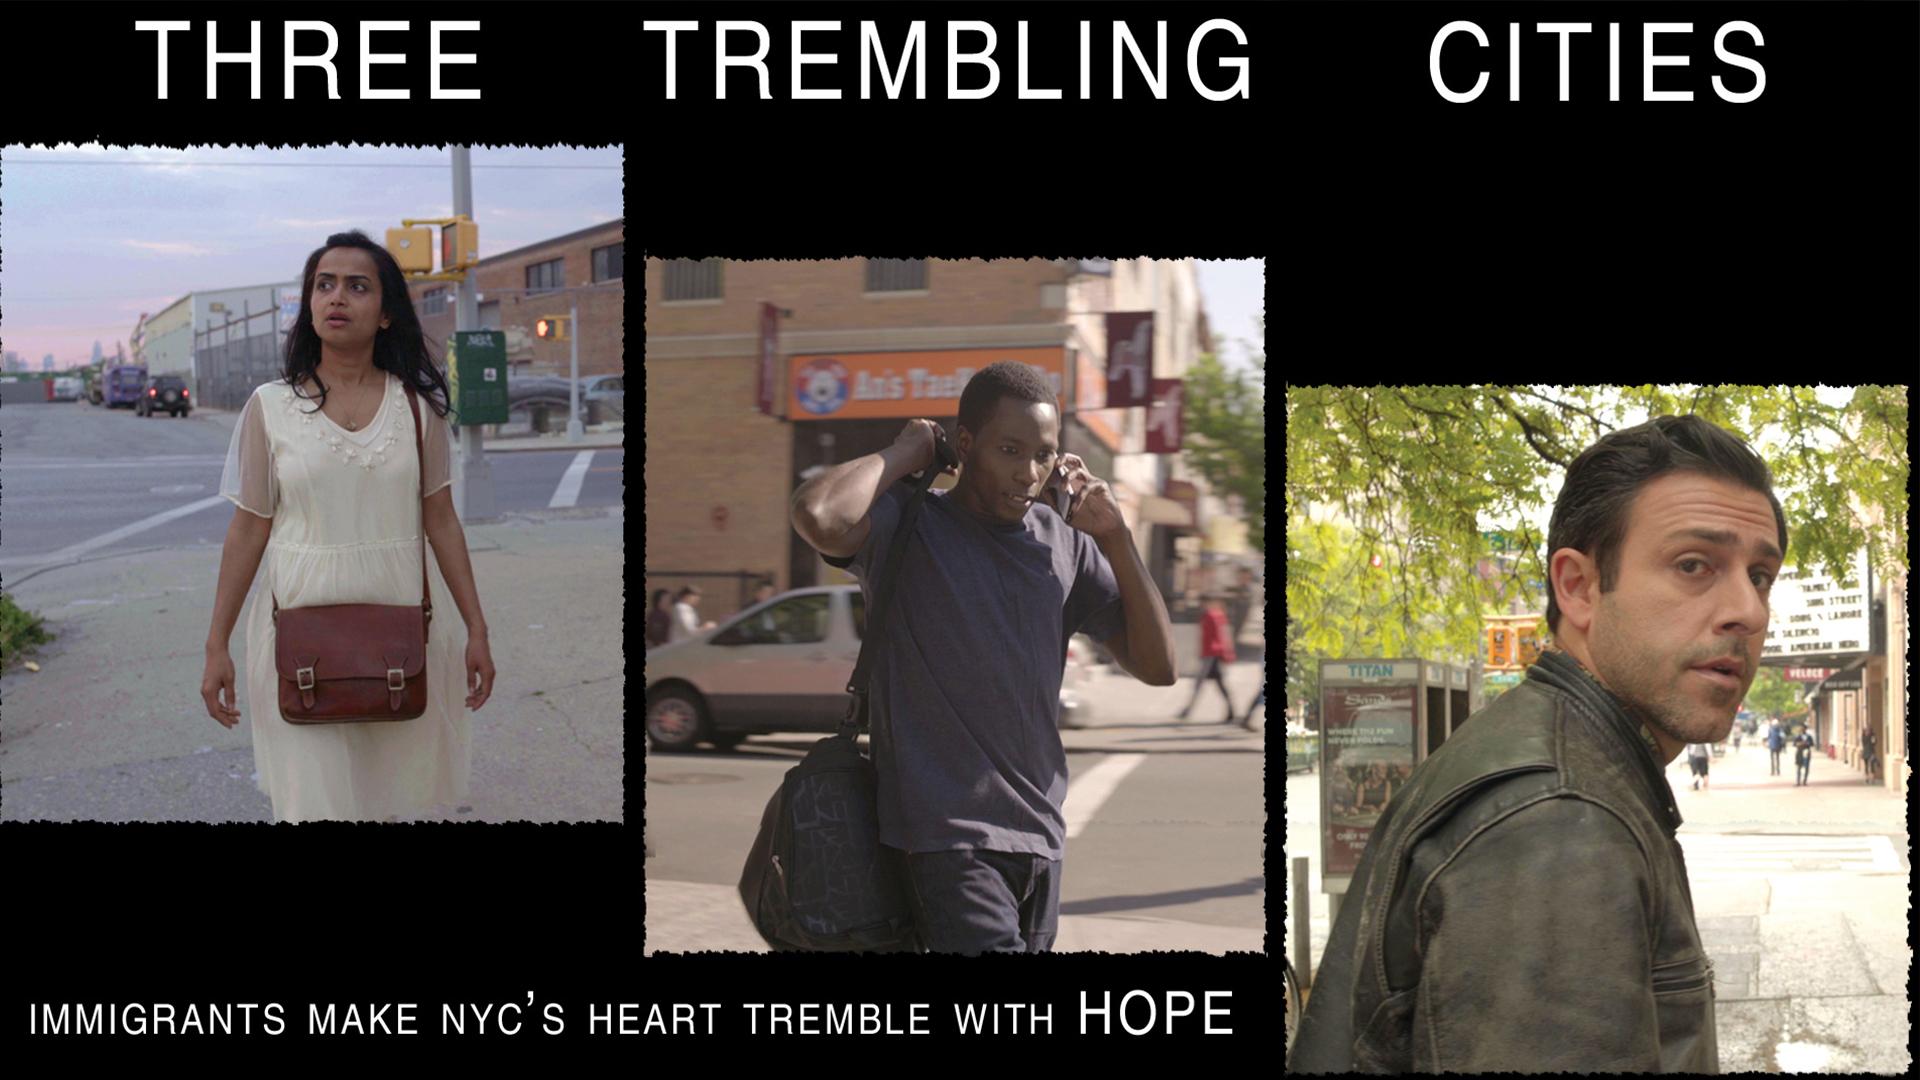 Three Trembling Cities